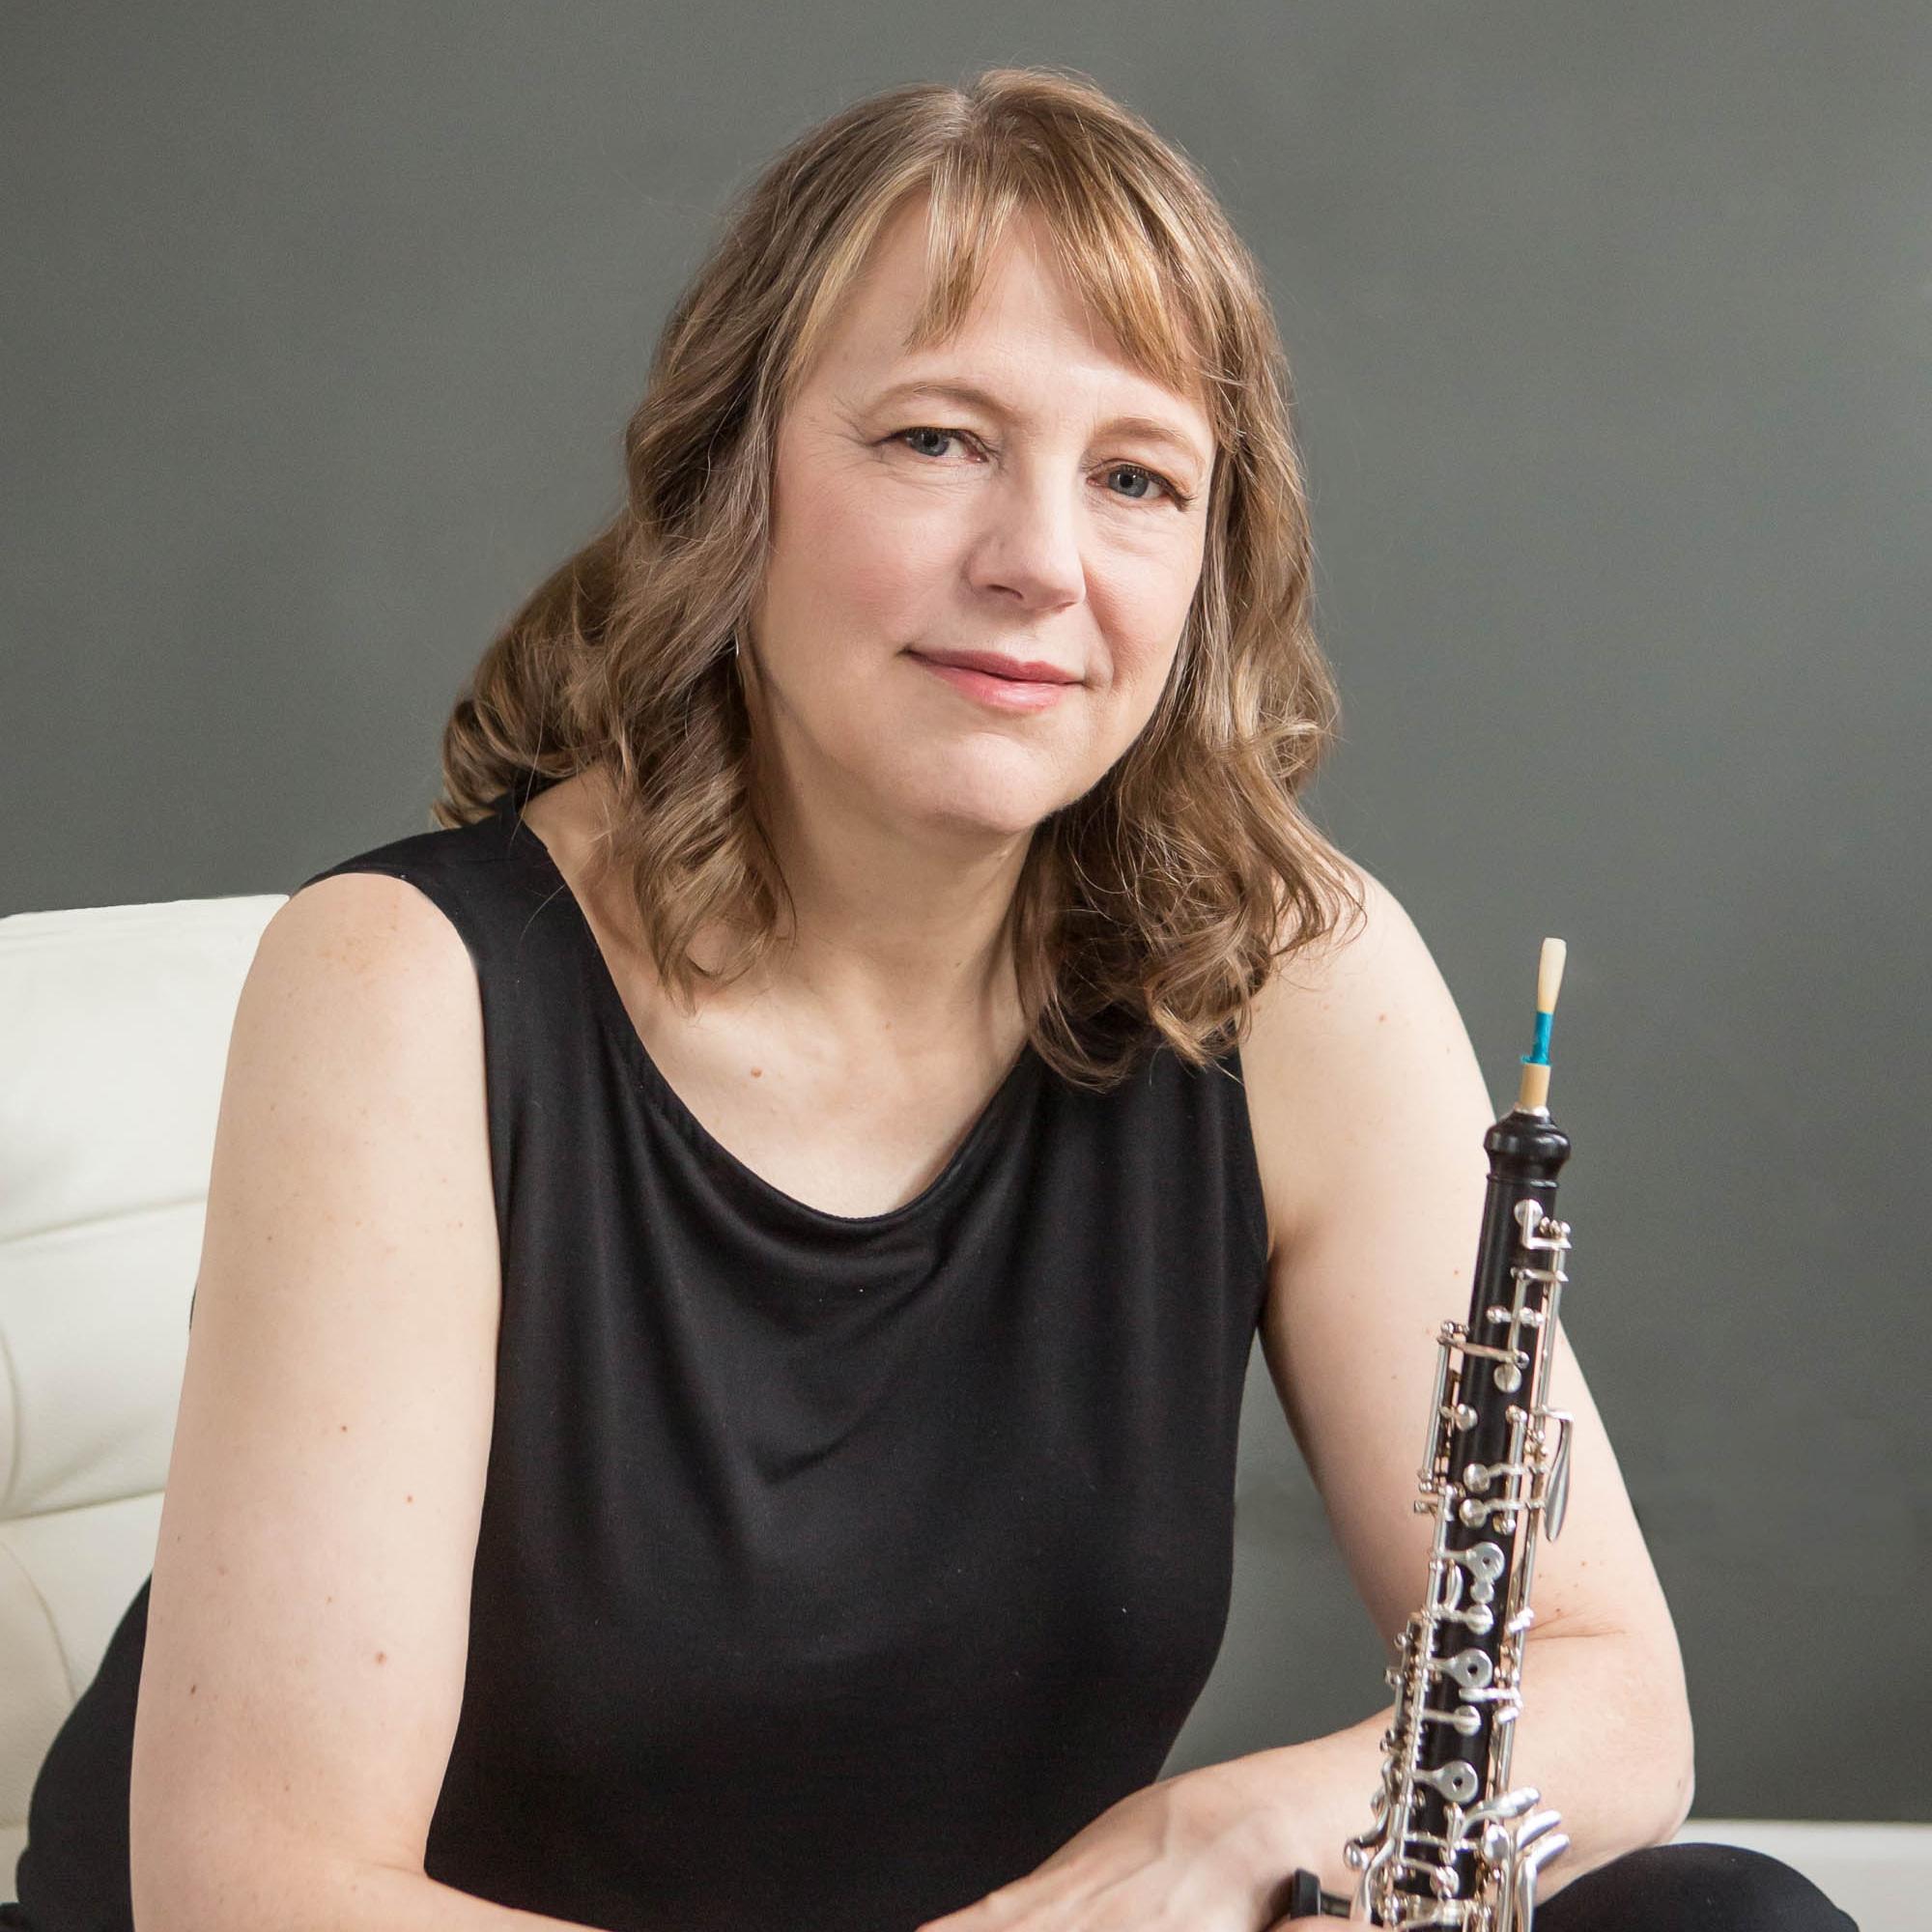 Janet Putnam